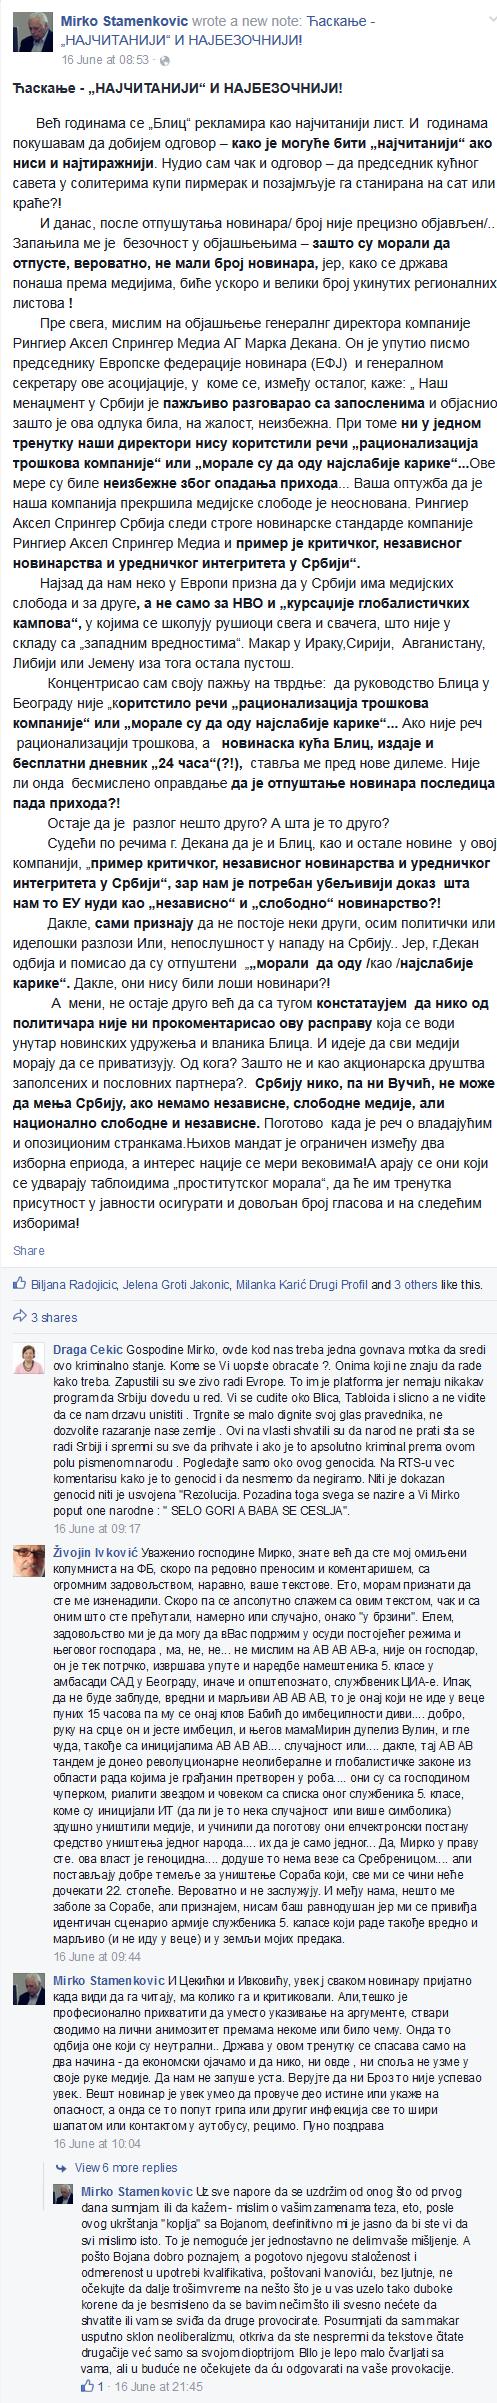 screenshot-www facebook com 2015-06-18 01-46-44